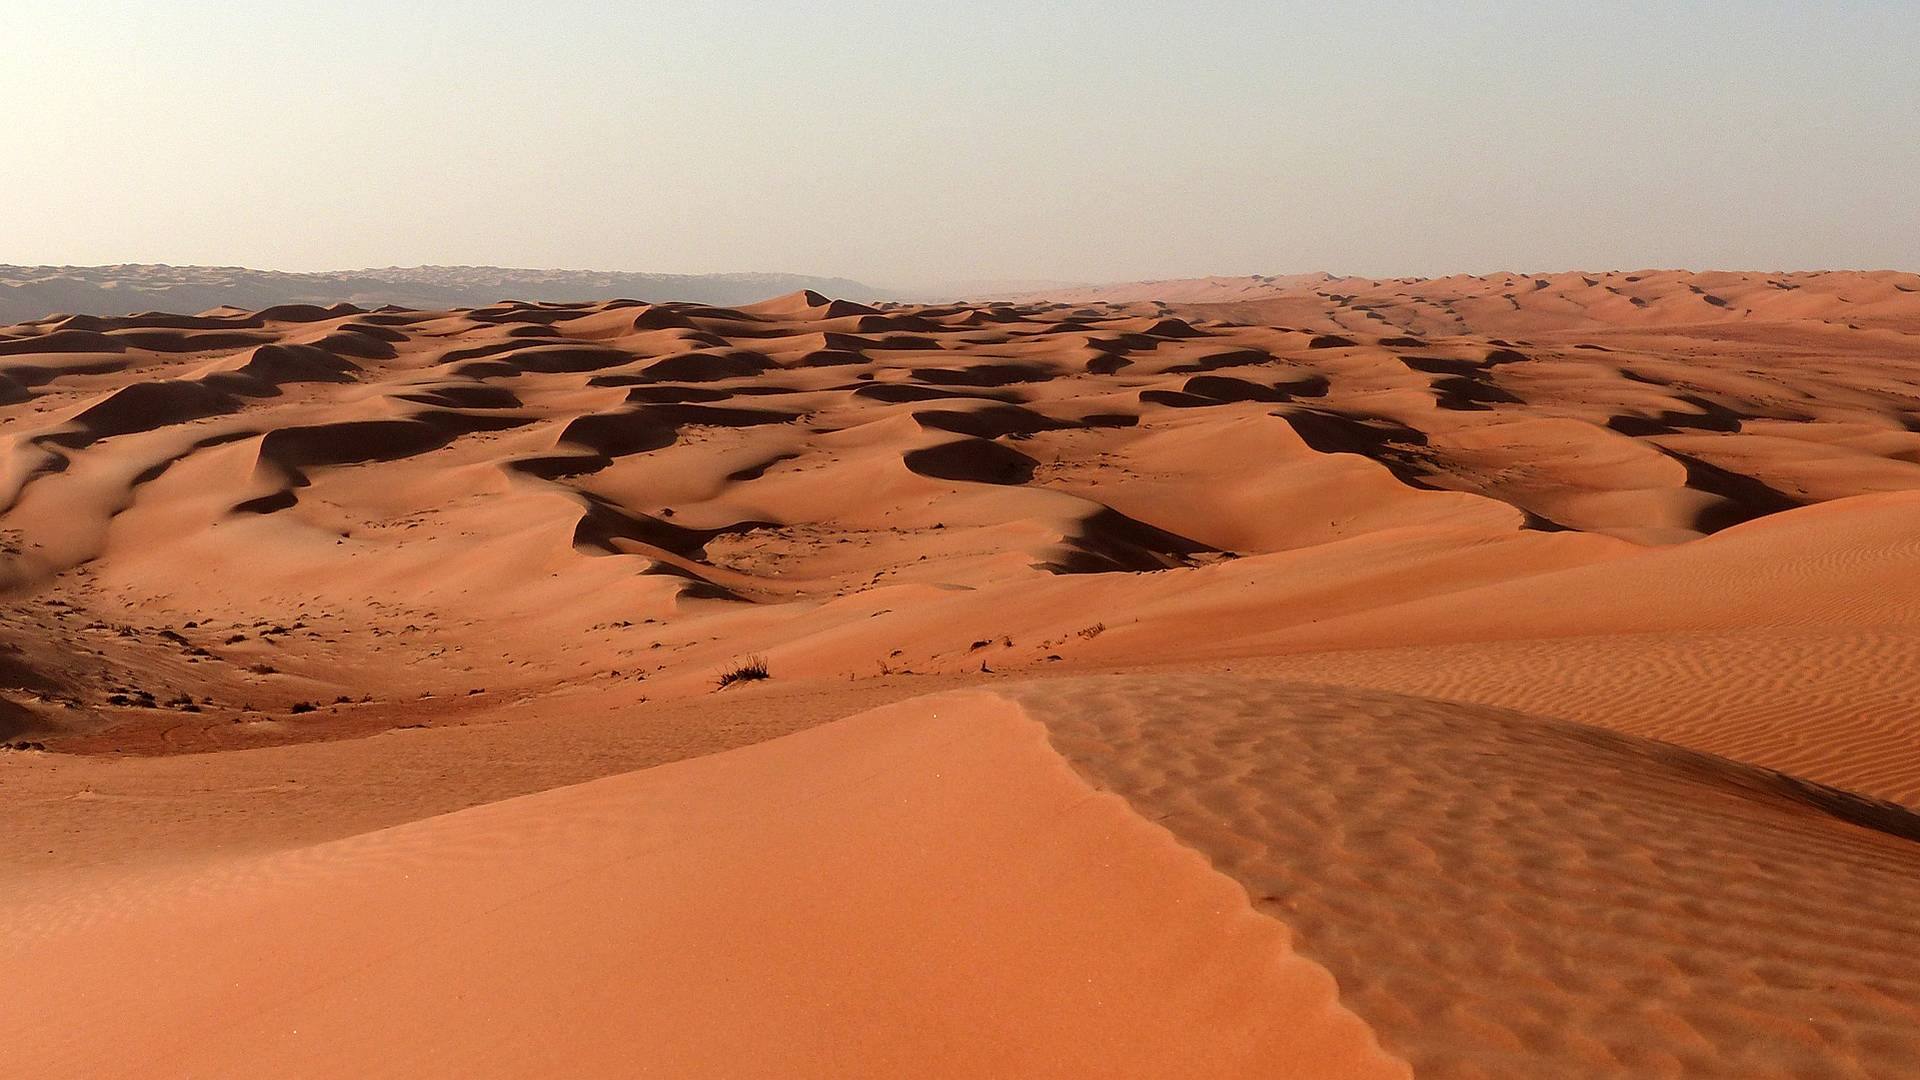 Desierto y la ruta de las mil Kasbahs